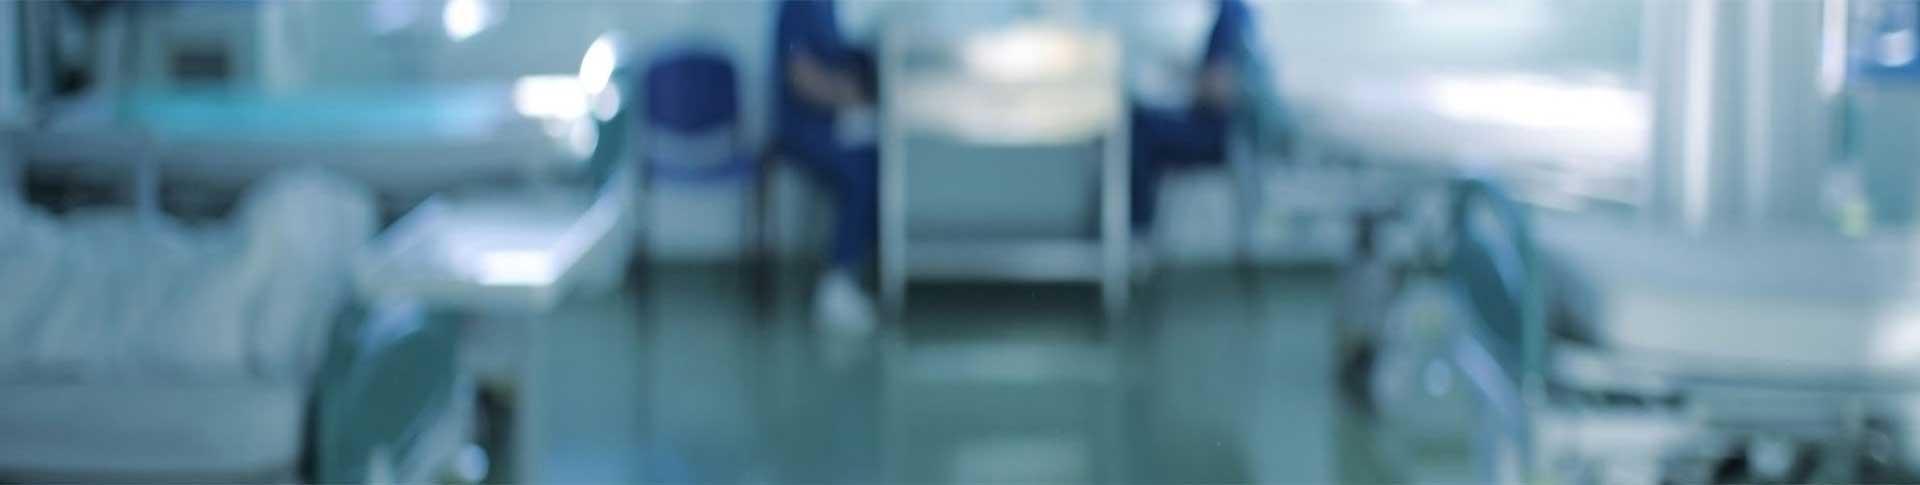 Emergency Medicine | Ichilov